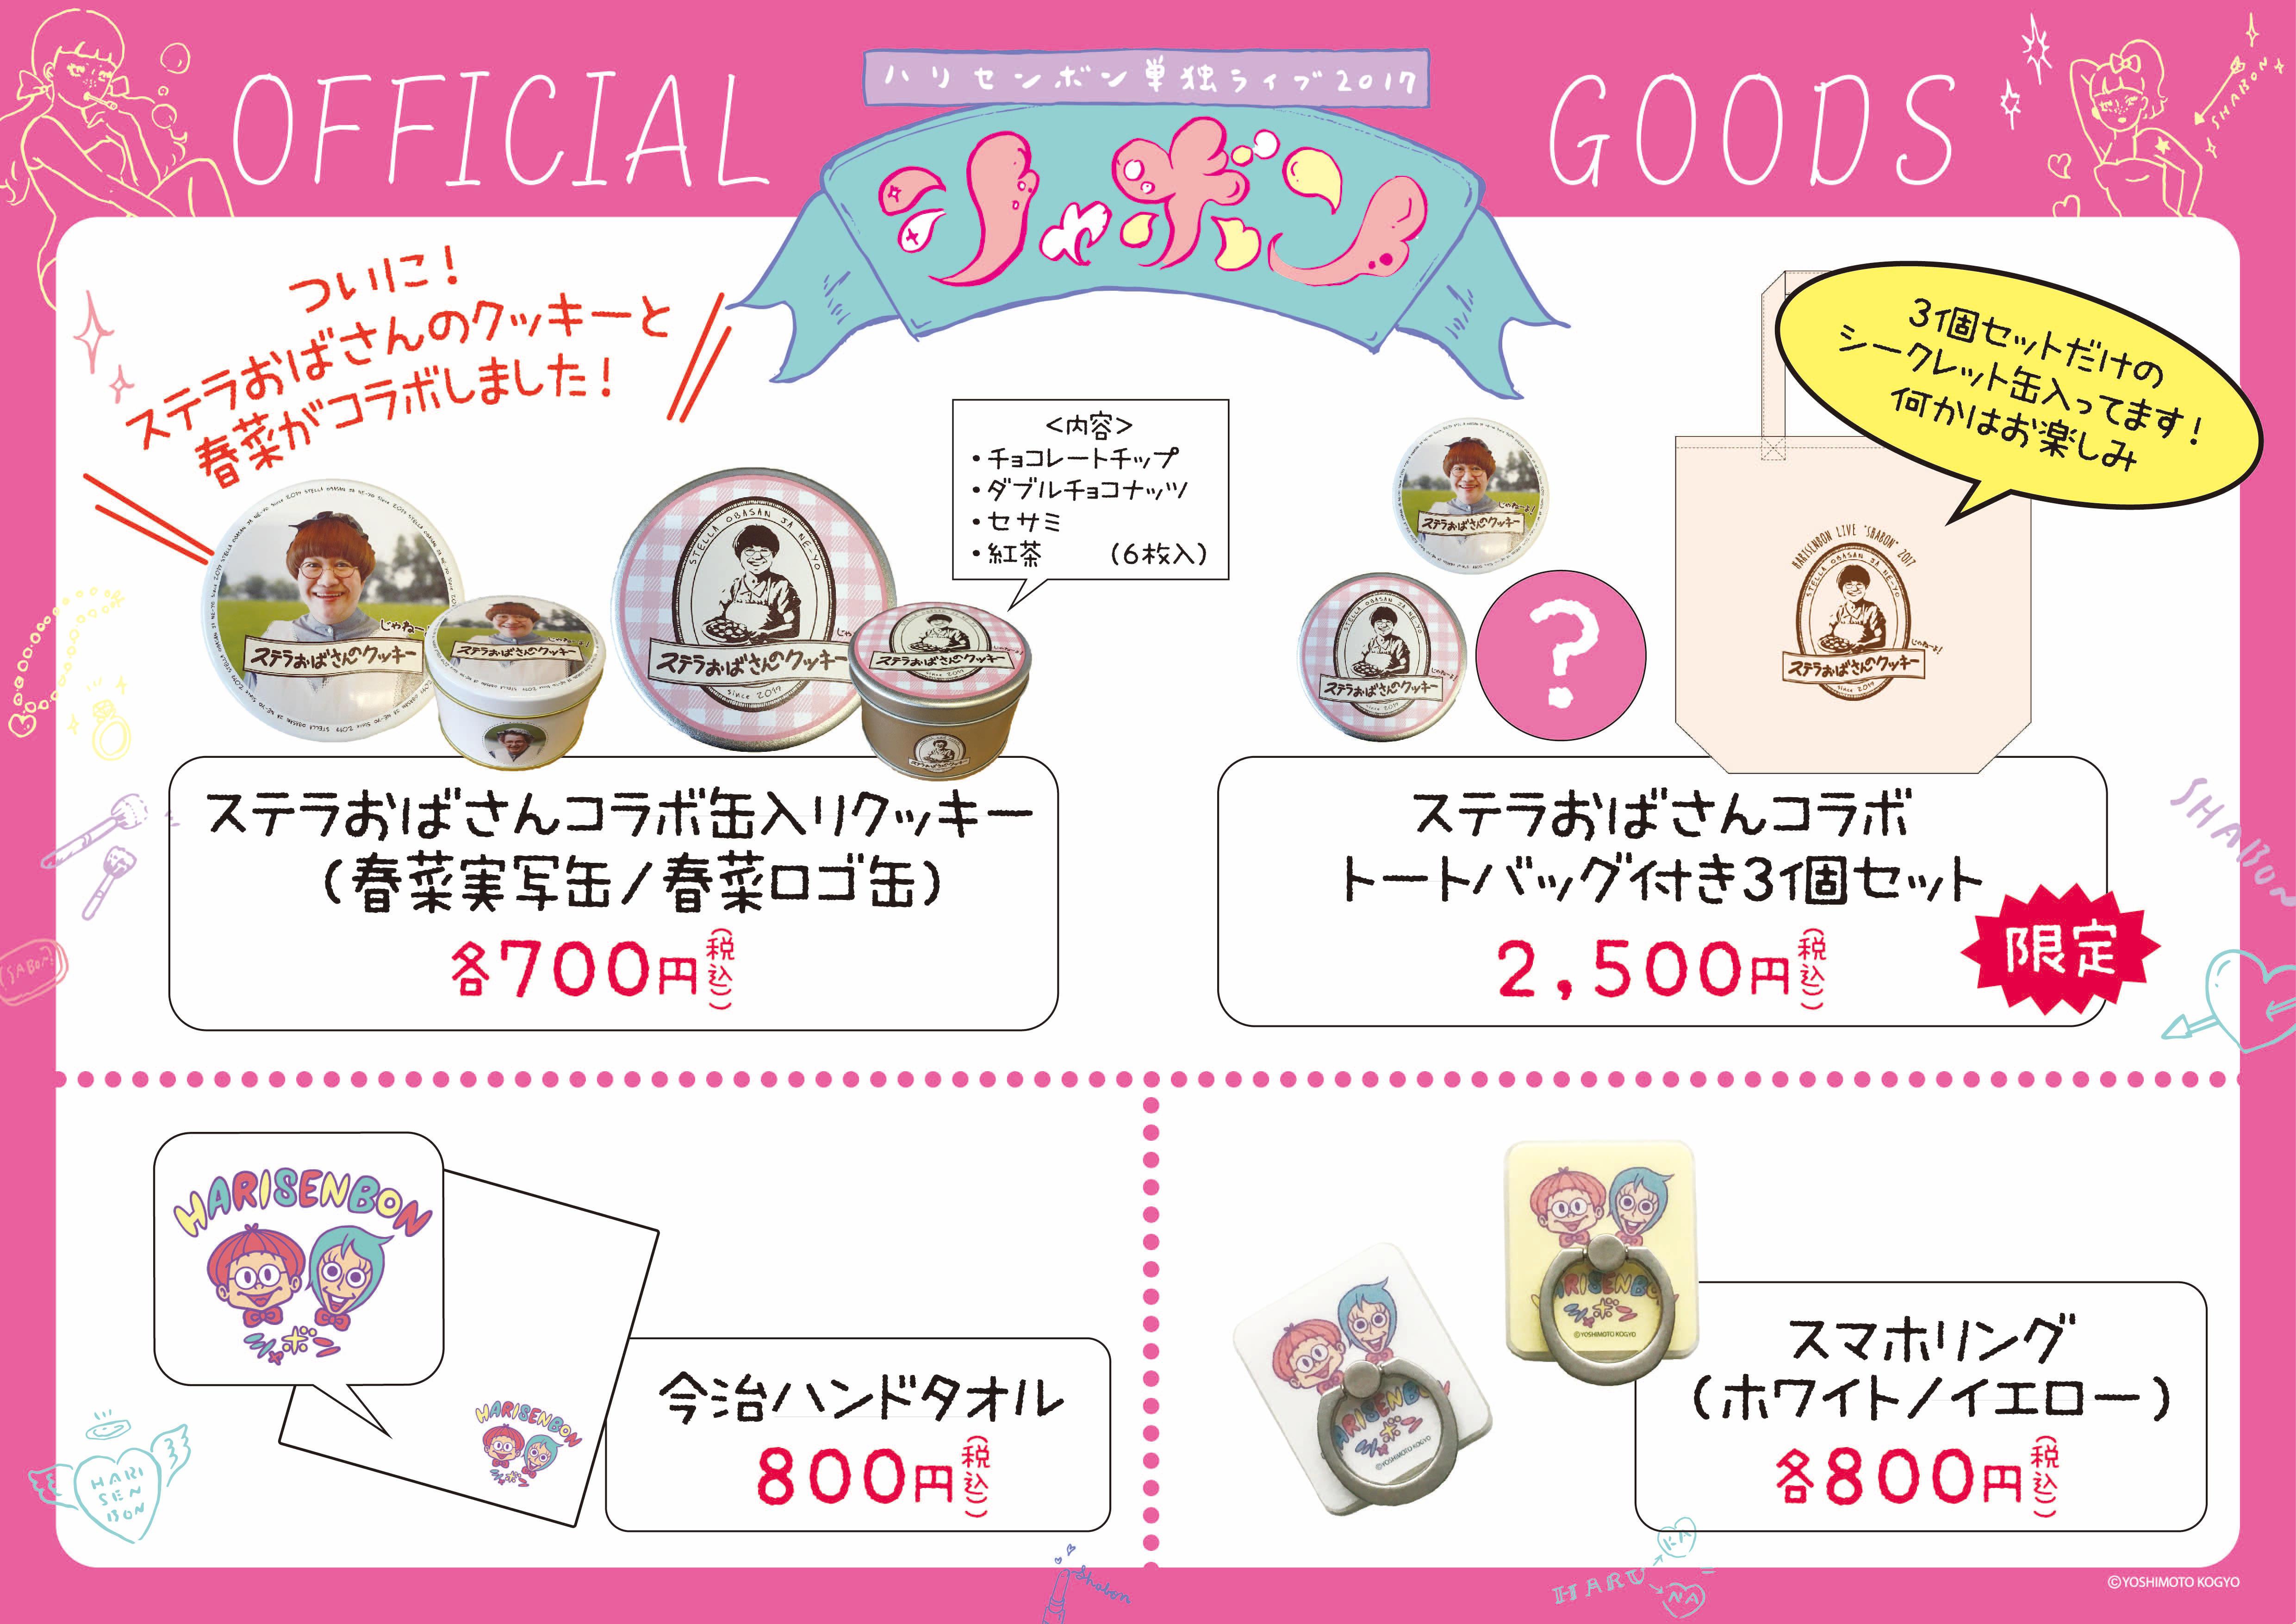 http://news.yoshimoto.co.jp/20171027112040-422b7594613f279a84a559510558e1621623c69a.jpg